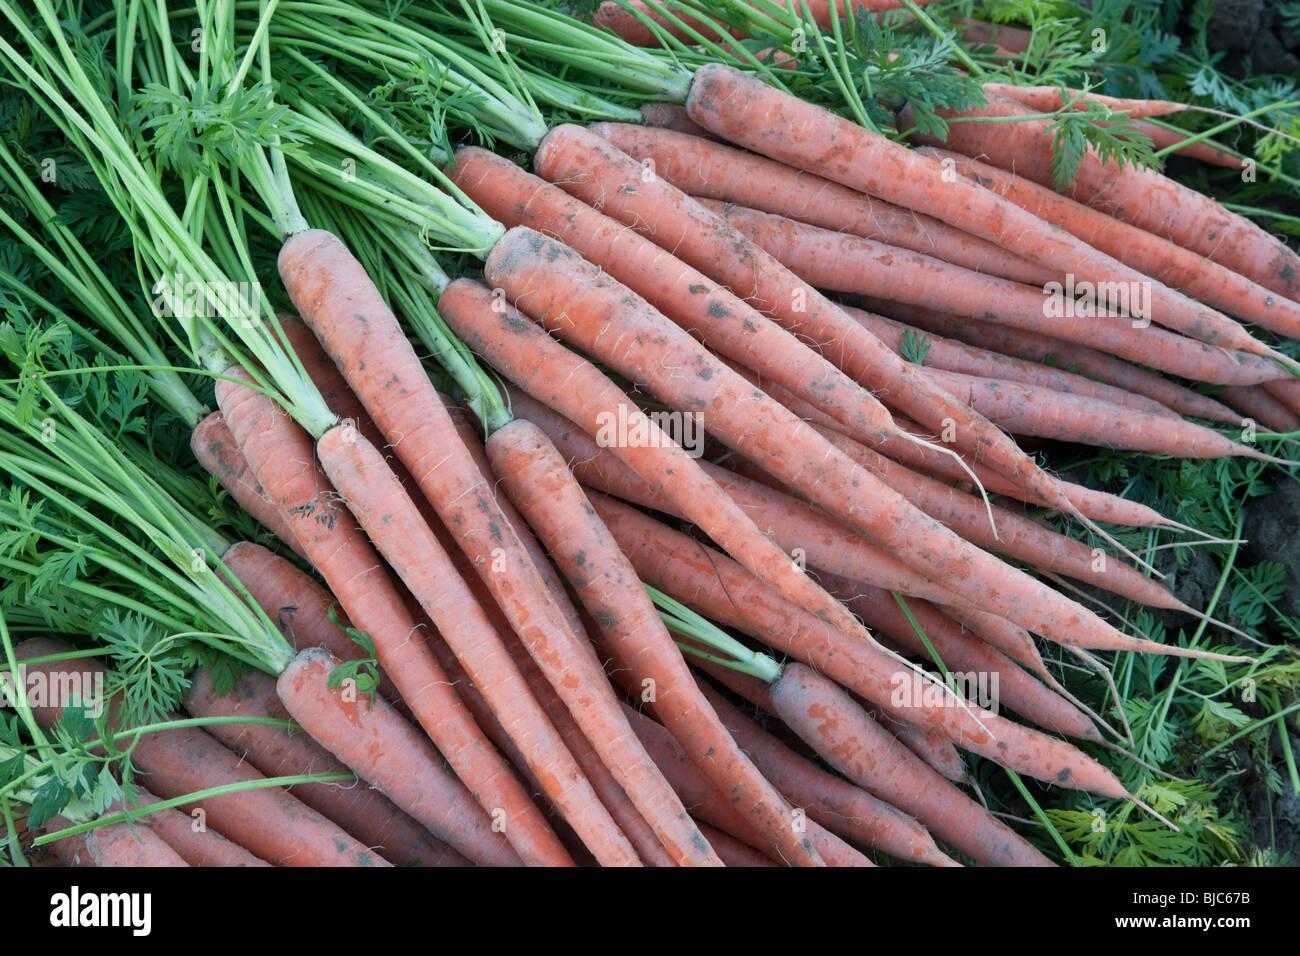 Carrots 'Daucus carota' harvest. - Stock Image